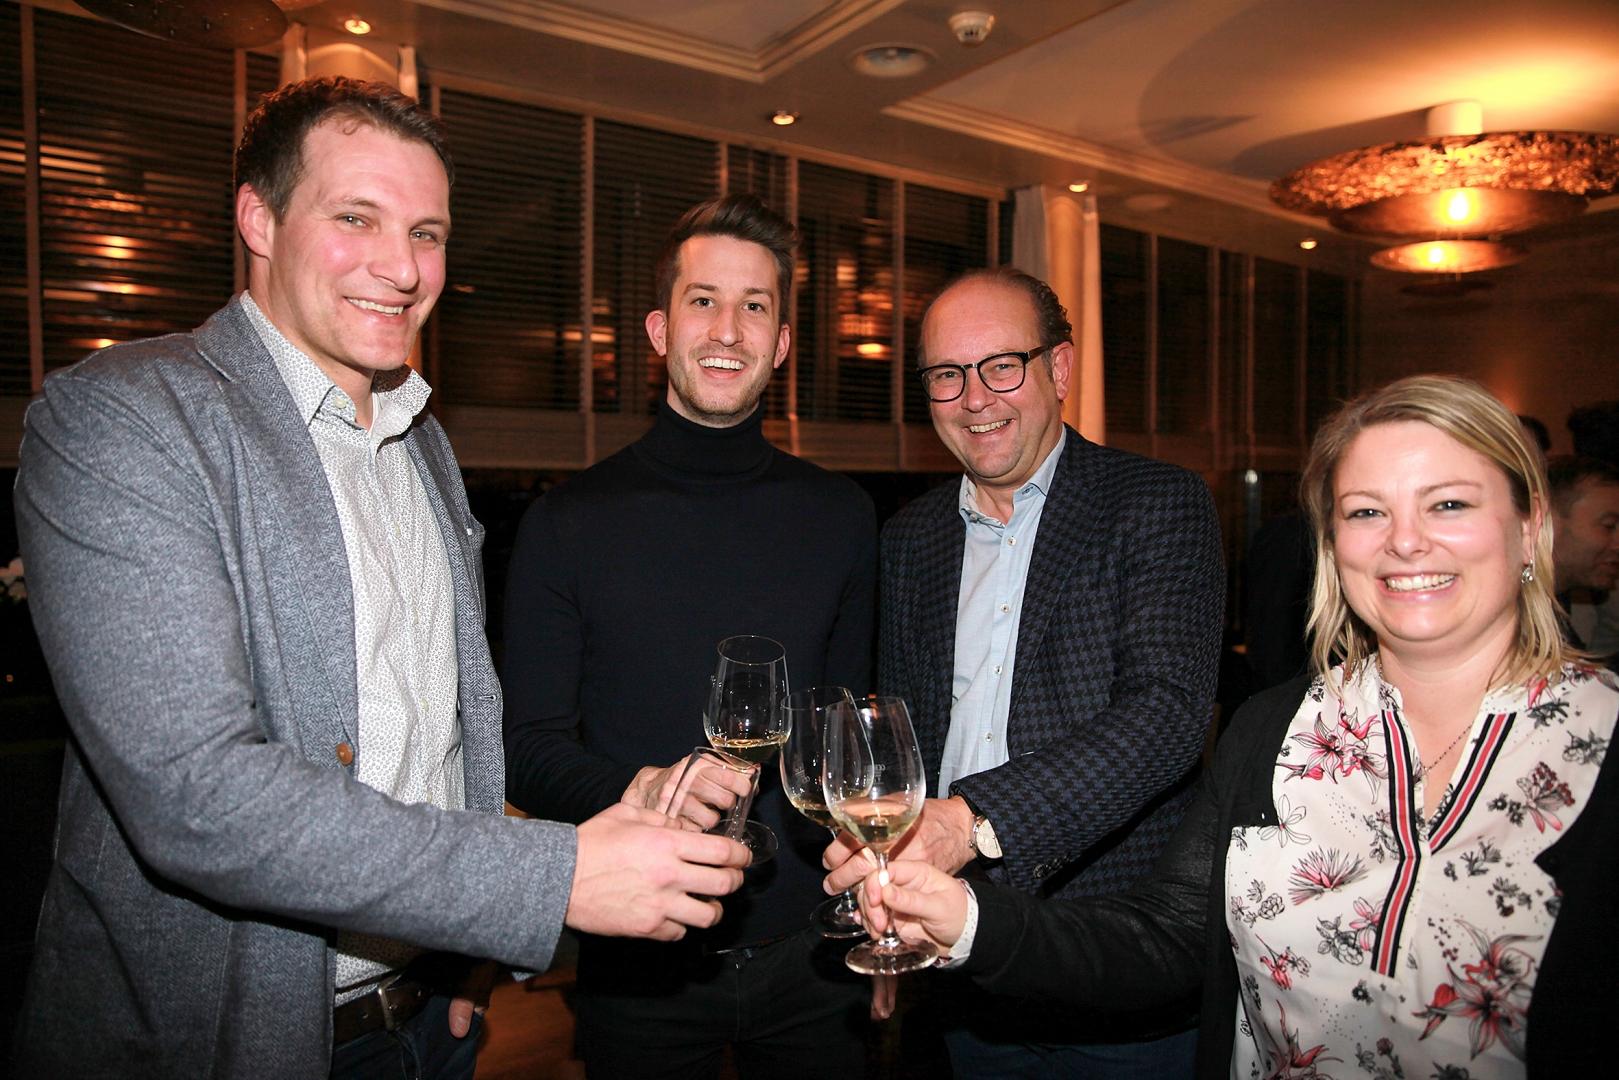 Grosser Support für Kantonsratskandidat Thomas Meier